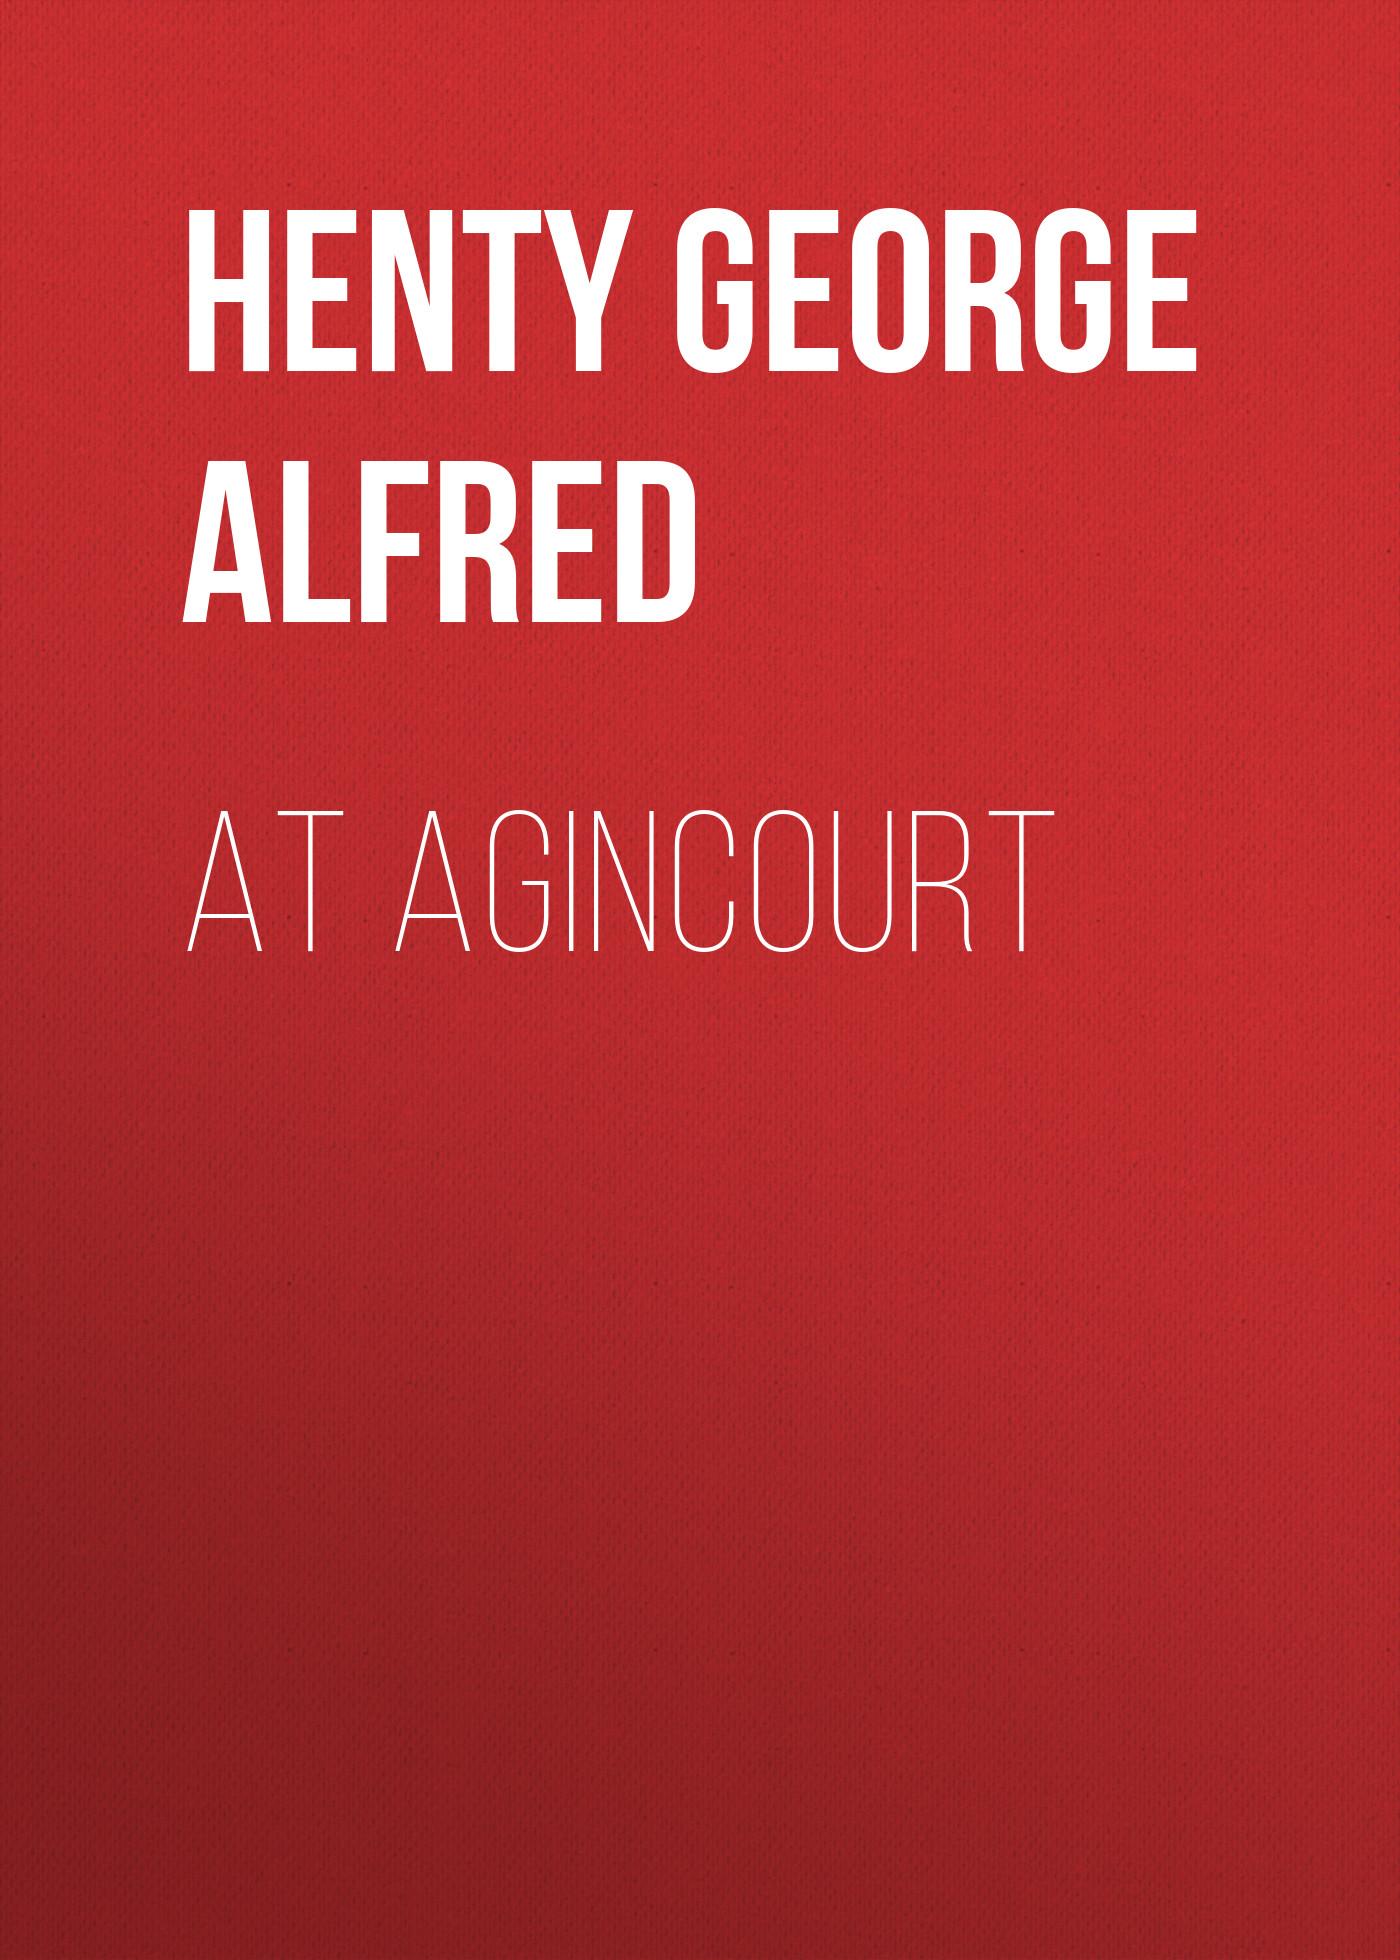 Henty George Alfred At Agincourt все цены